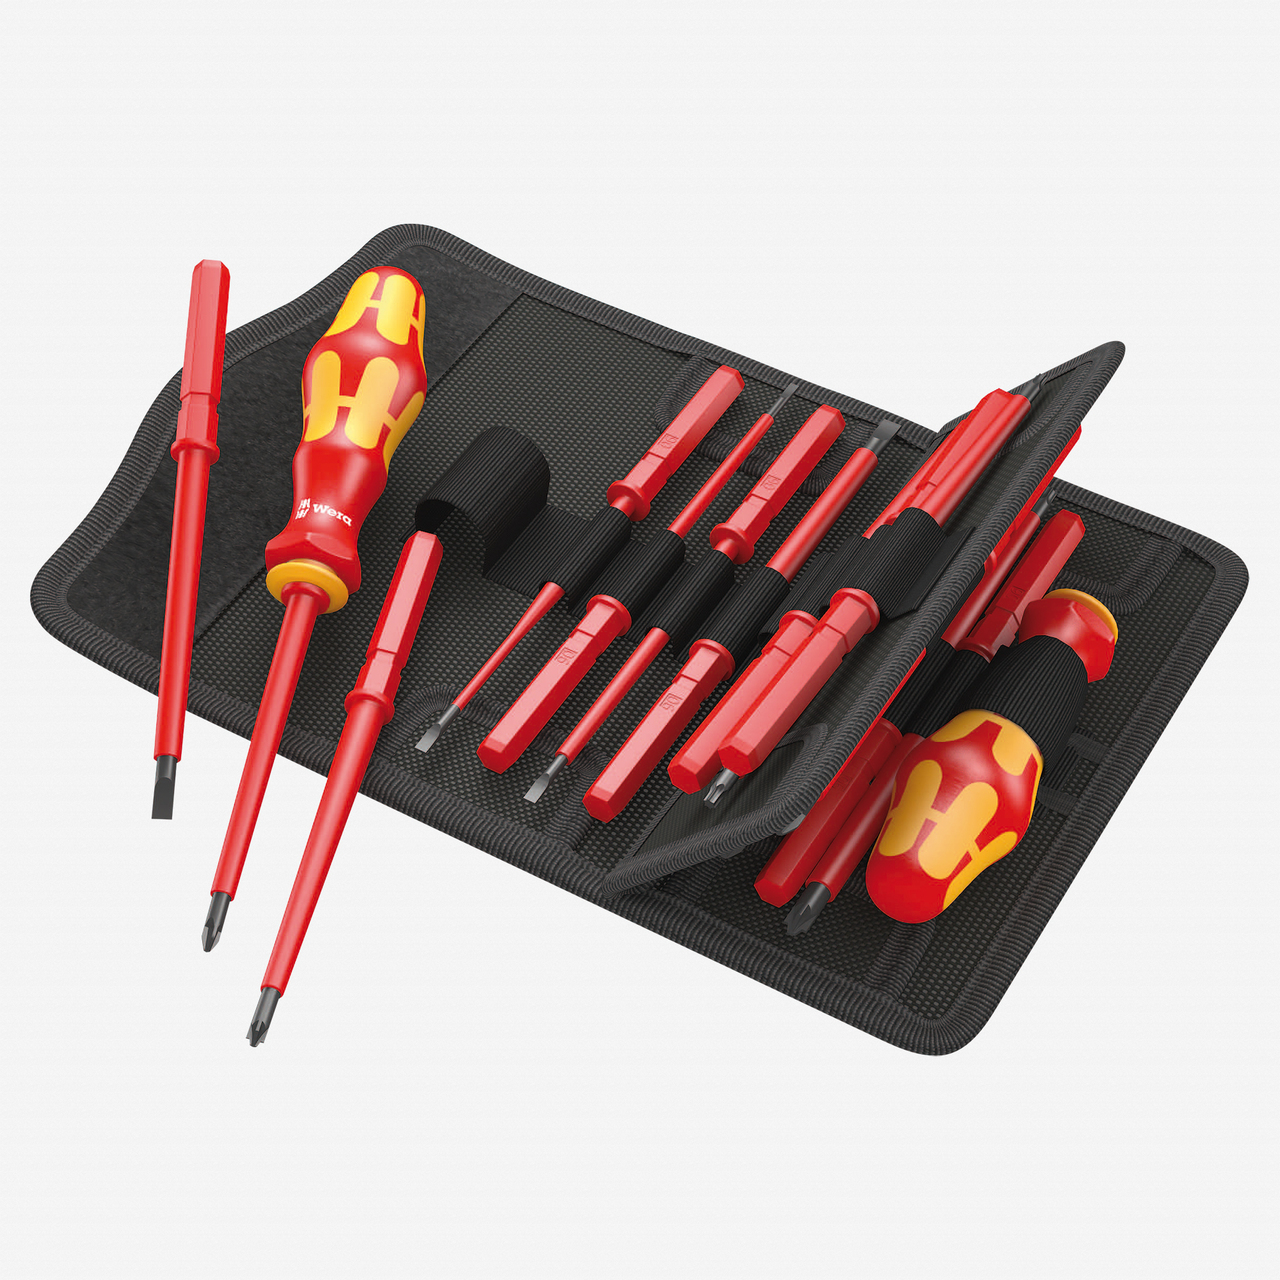 Wera 059030 Kraftform Kompakt VDE 60 i/65 i/67 i/17 SL/PH/PZ/PZS/TX Insulated Screwdriver Set - KC Tool